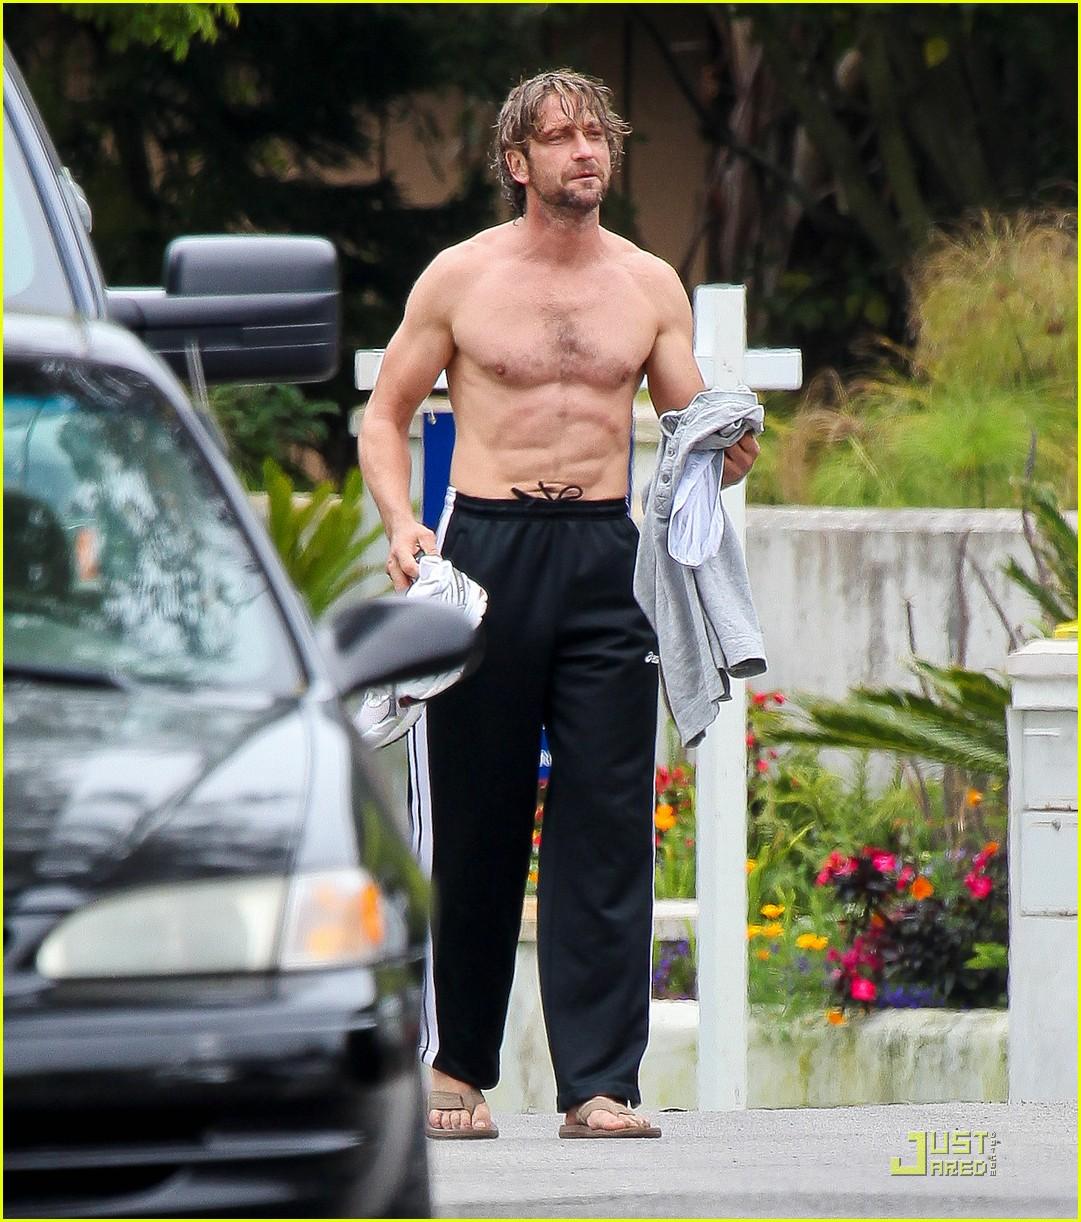 http://1.bp.blogspot.com/-l9GGVq7_abQ/TiOAXowOO7I/AAAAAAAABaE/rypoLy8FpQc/s1600/gerard-butler-shirtless-surfer-in-malibu-01.jpg